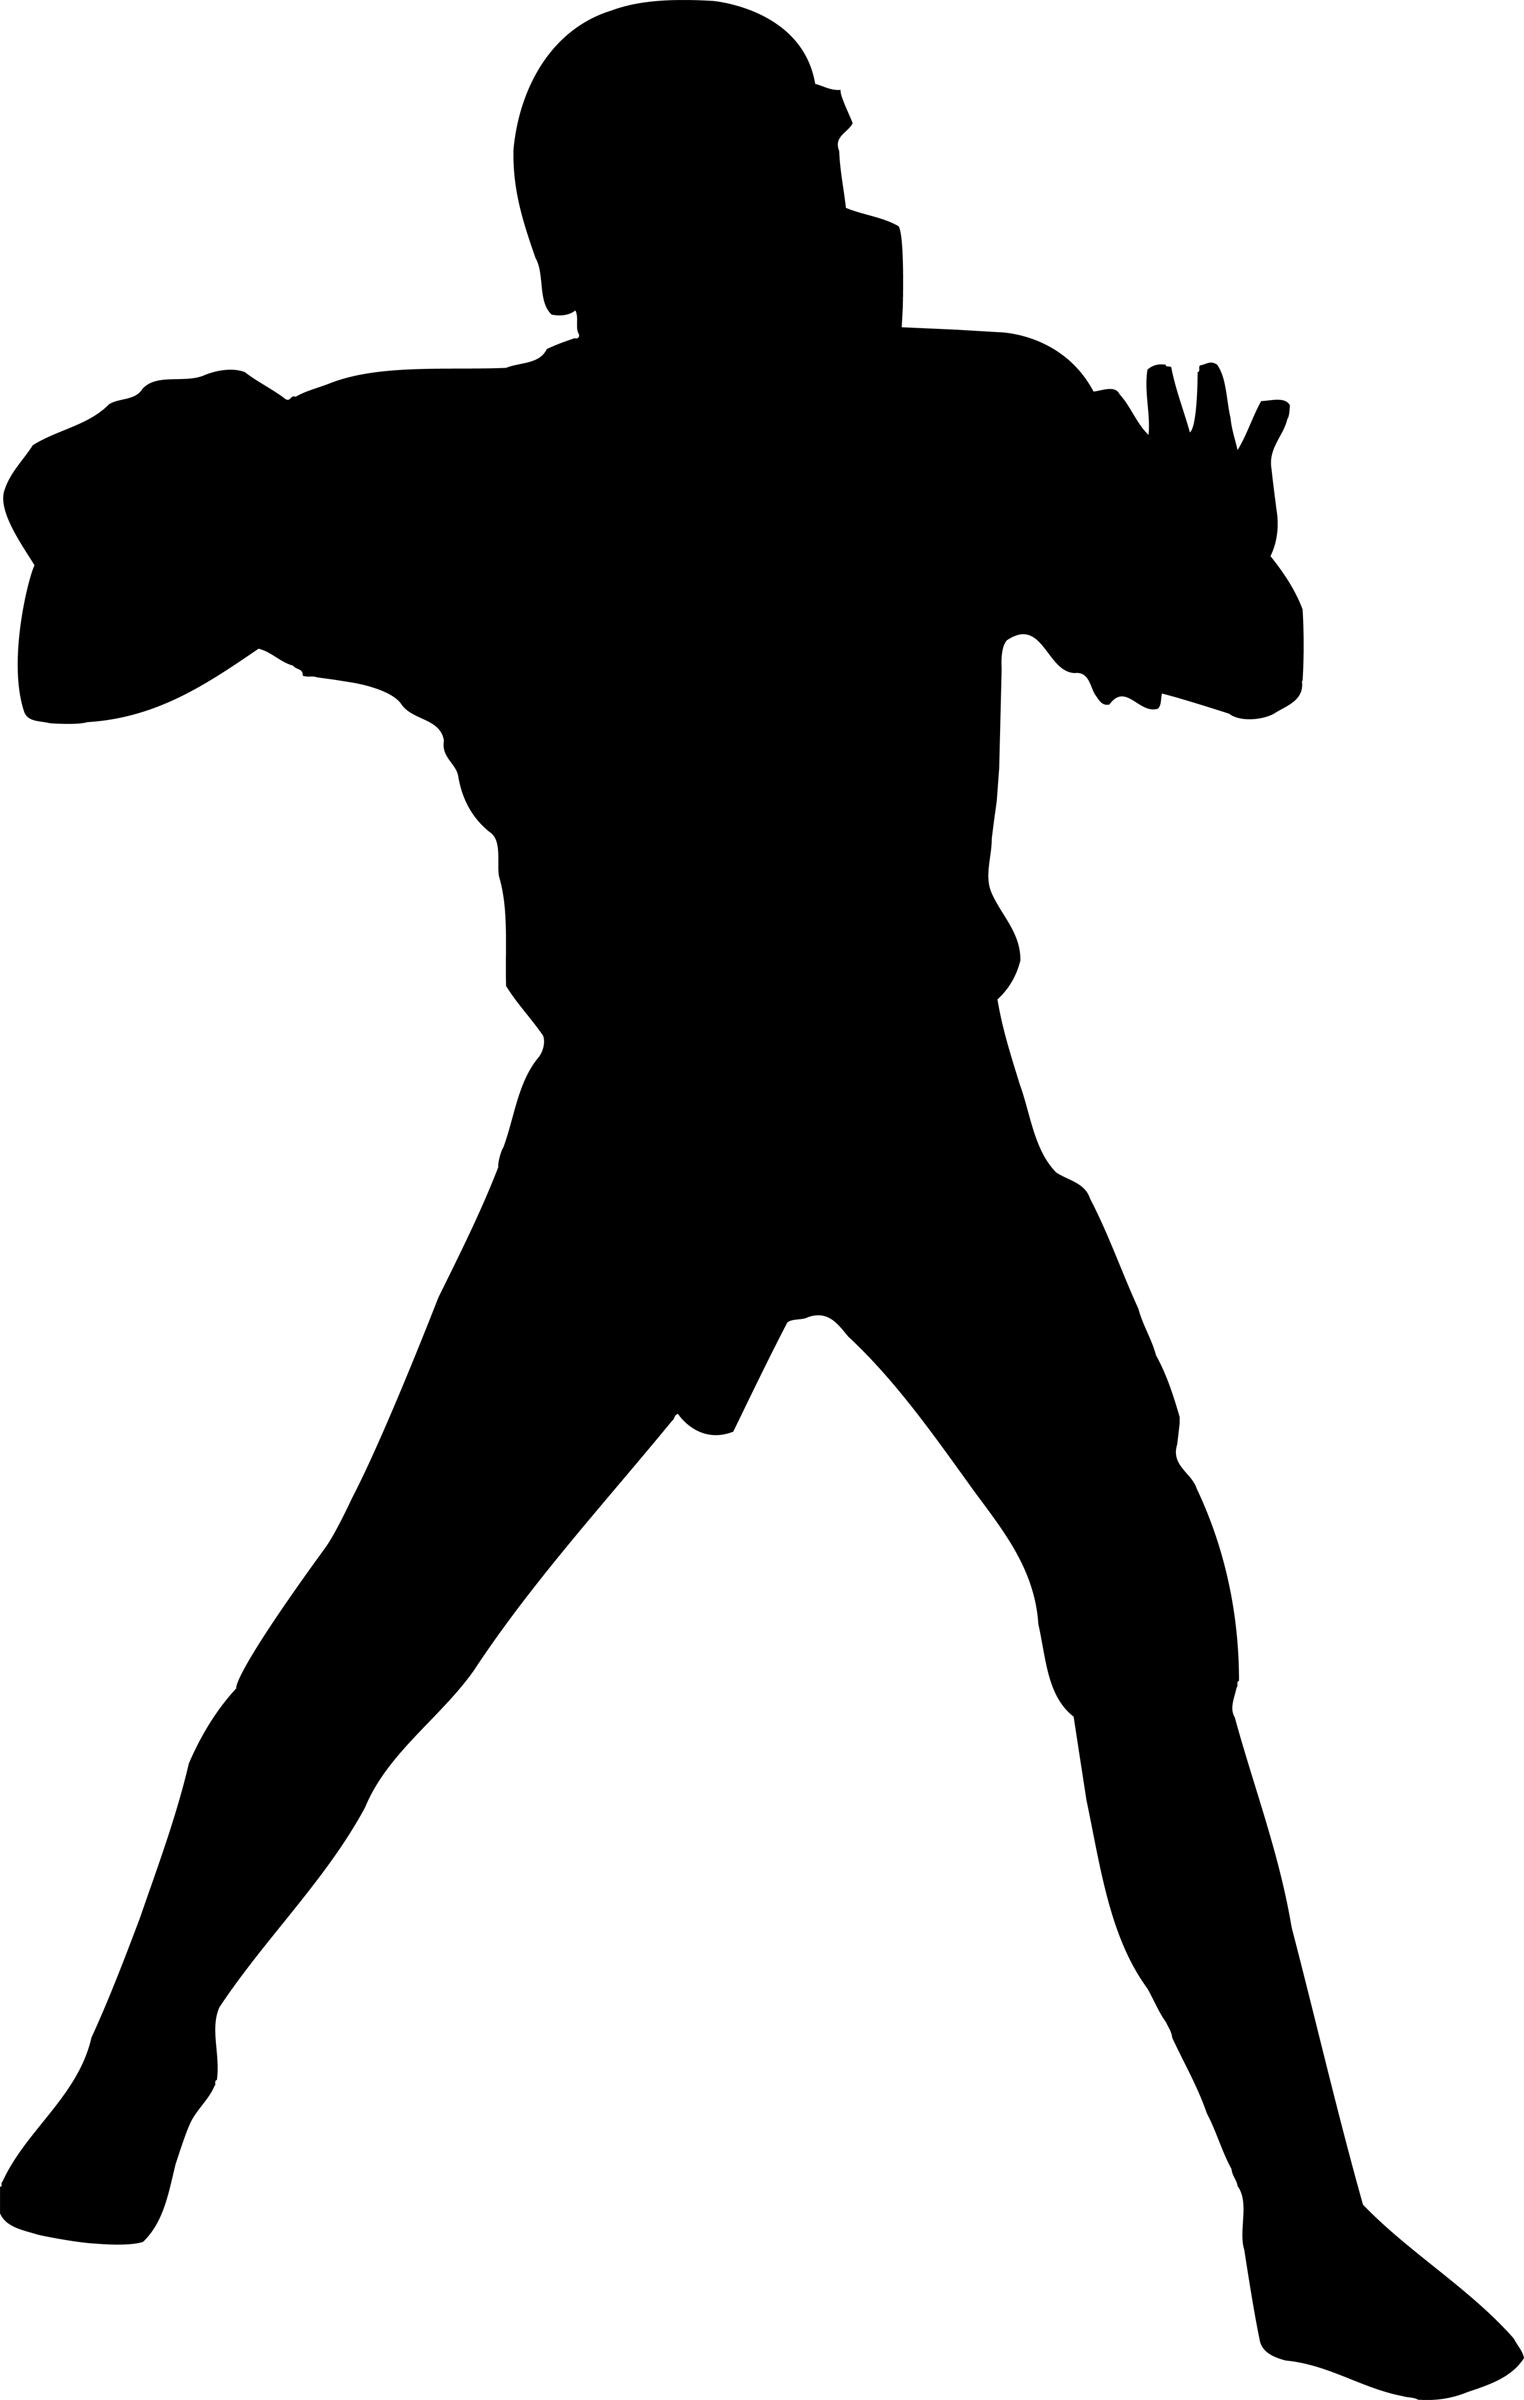 1524x2400 Football Quarterback Silhouette Clipart